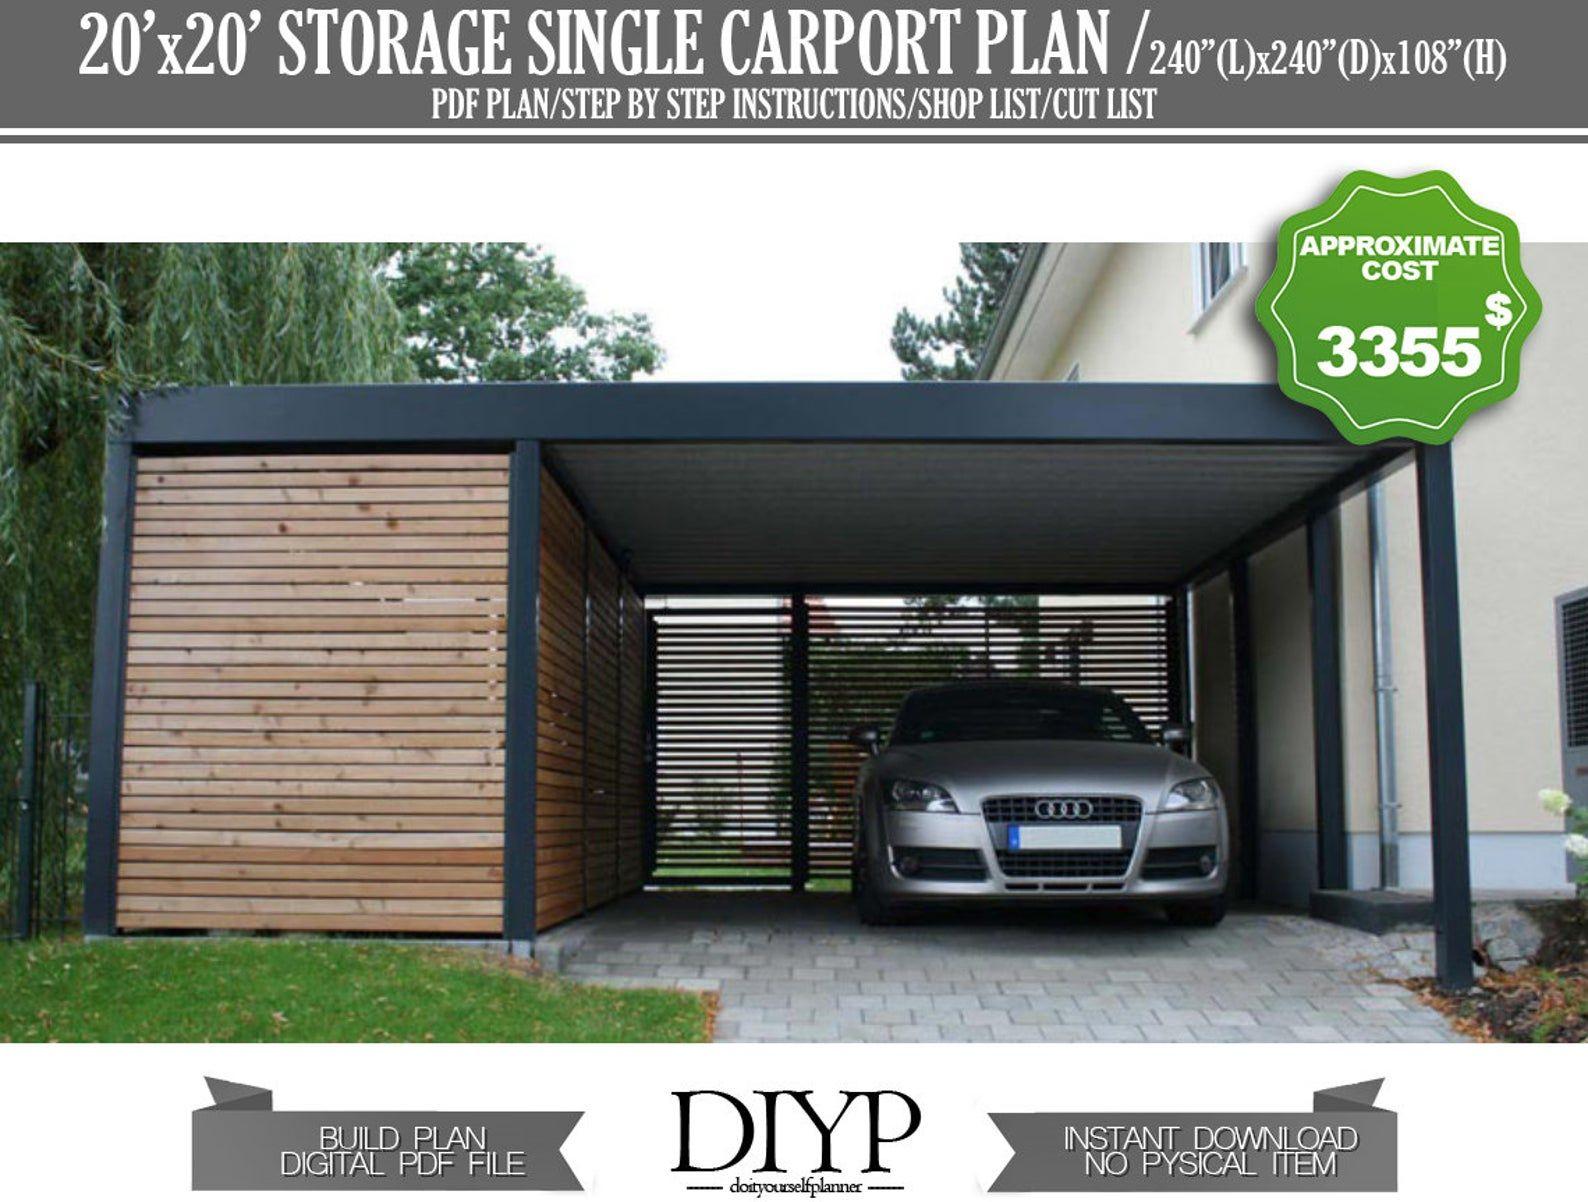 Car Garage Build Plan Single Car Port Plans Carport With Storage Plan Carport Shed Build A Carport Diy Garage Plans 20x20 Shed In 2021 Modern Garage Garage Design Modern Garage Design